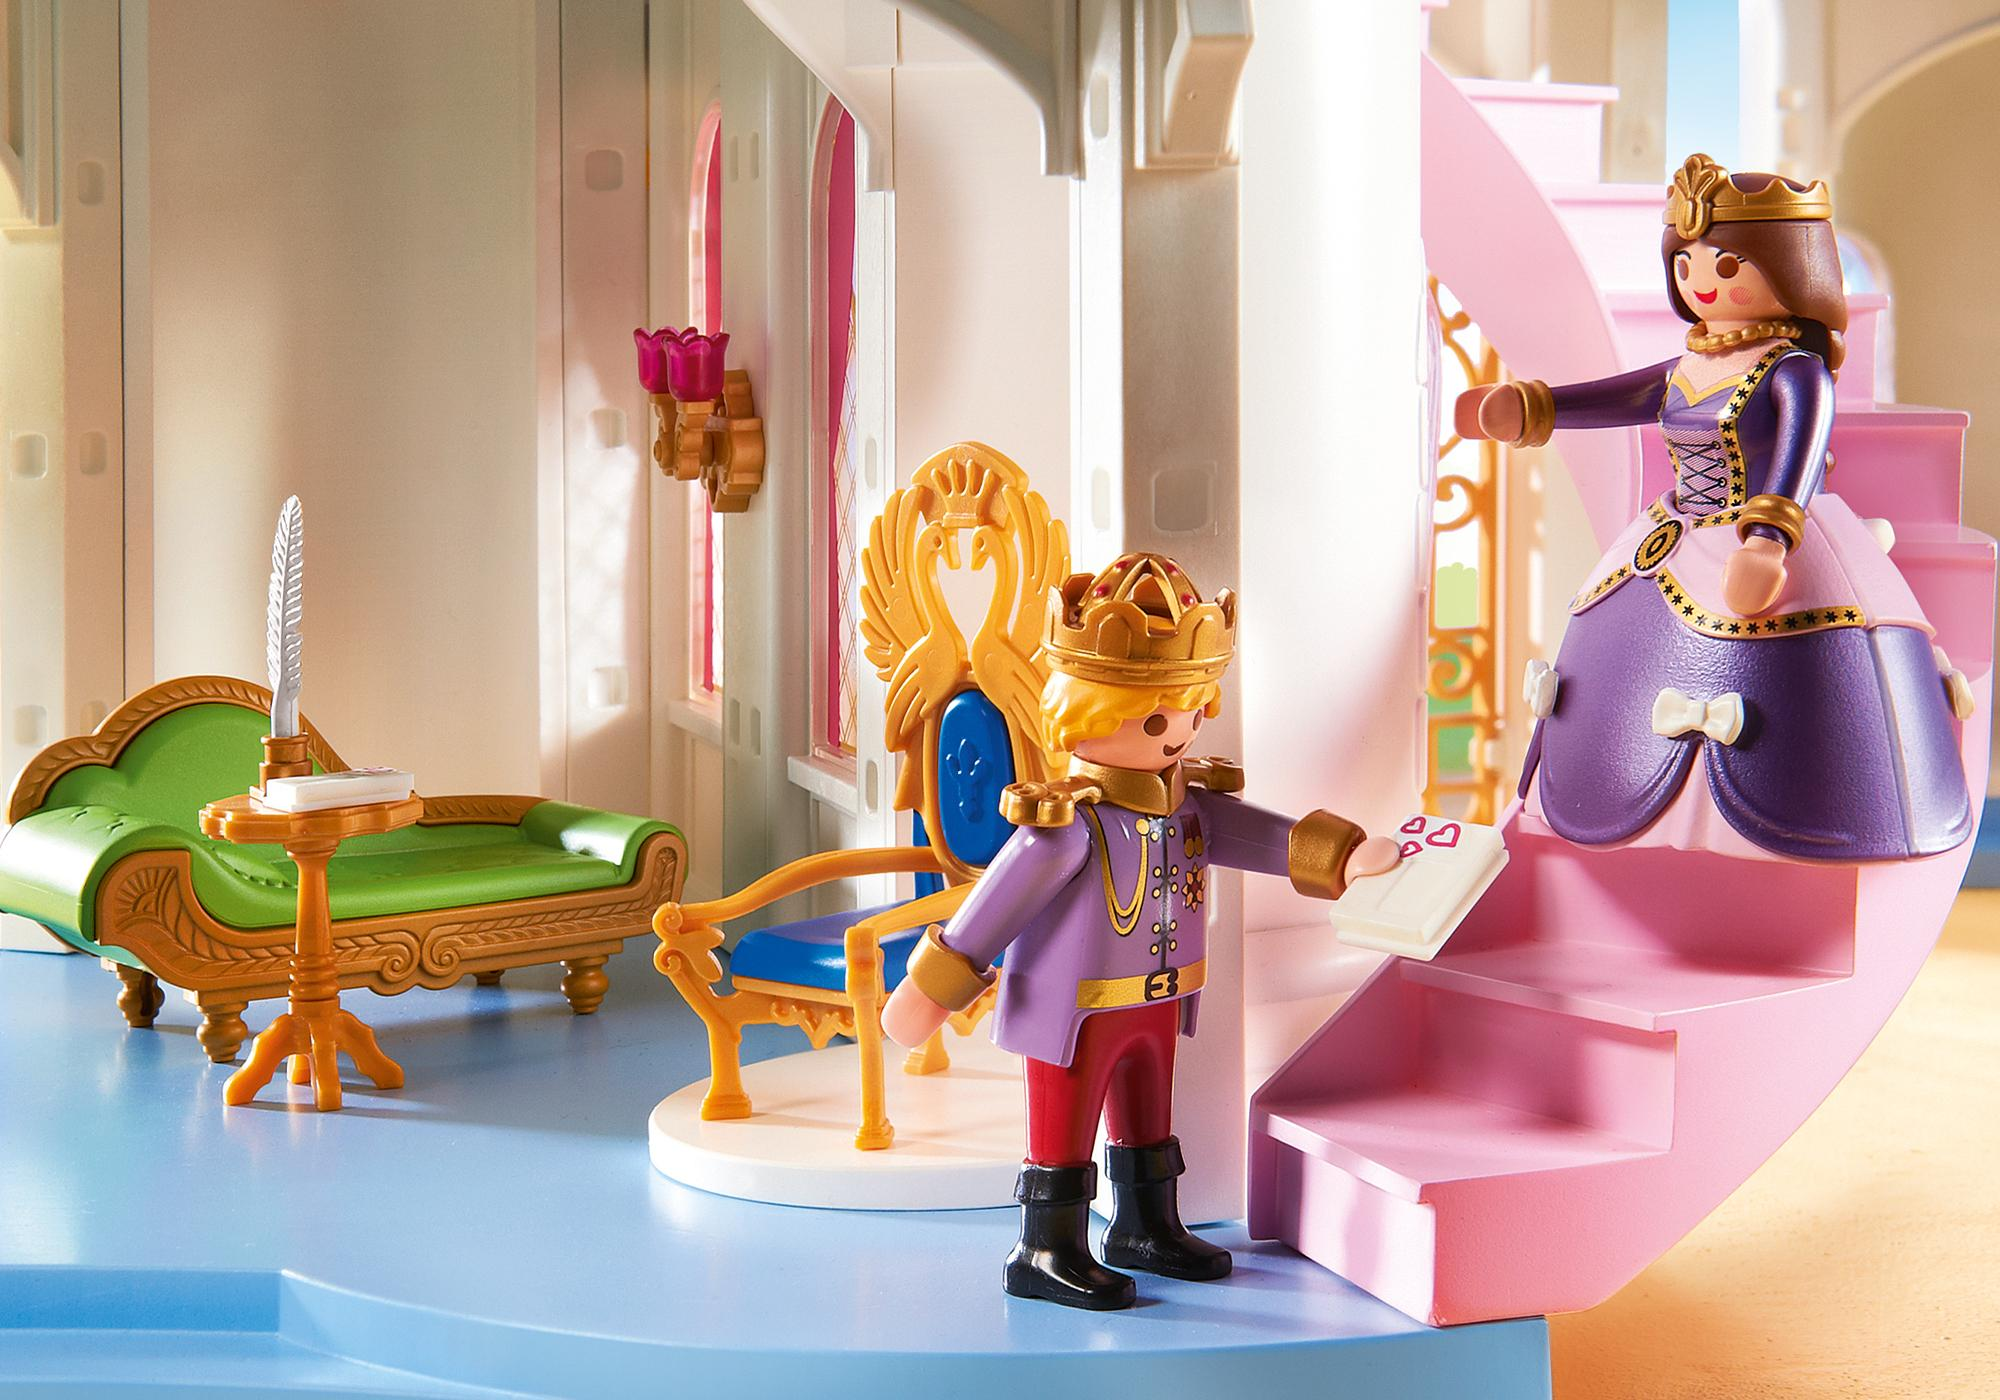 http://media.playmobil.com/i/playmobil/6848_product_extra1/Prinzessinnenschloss